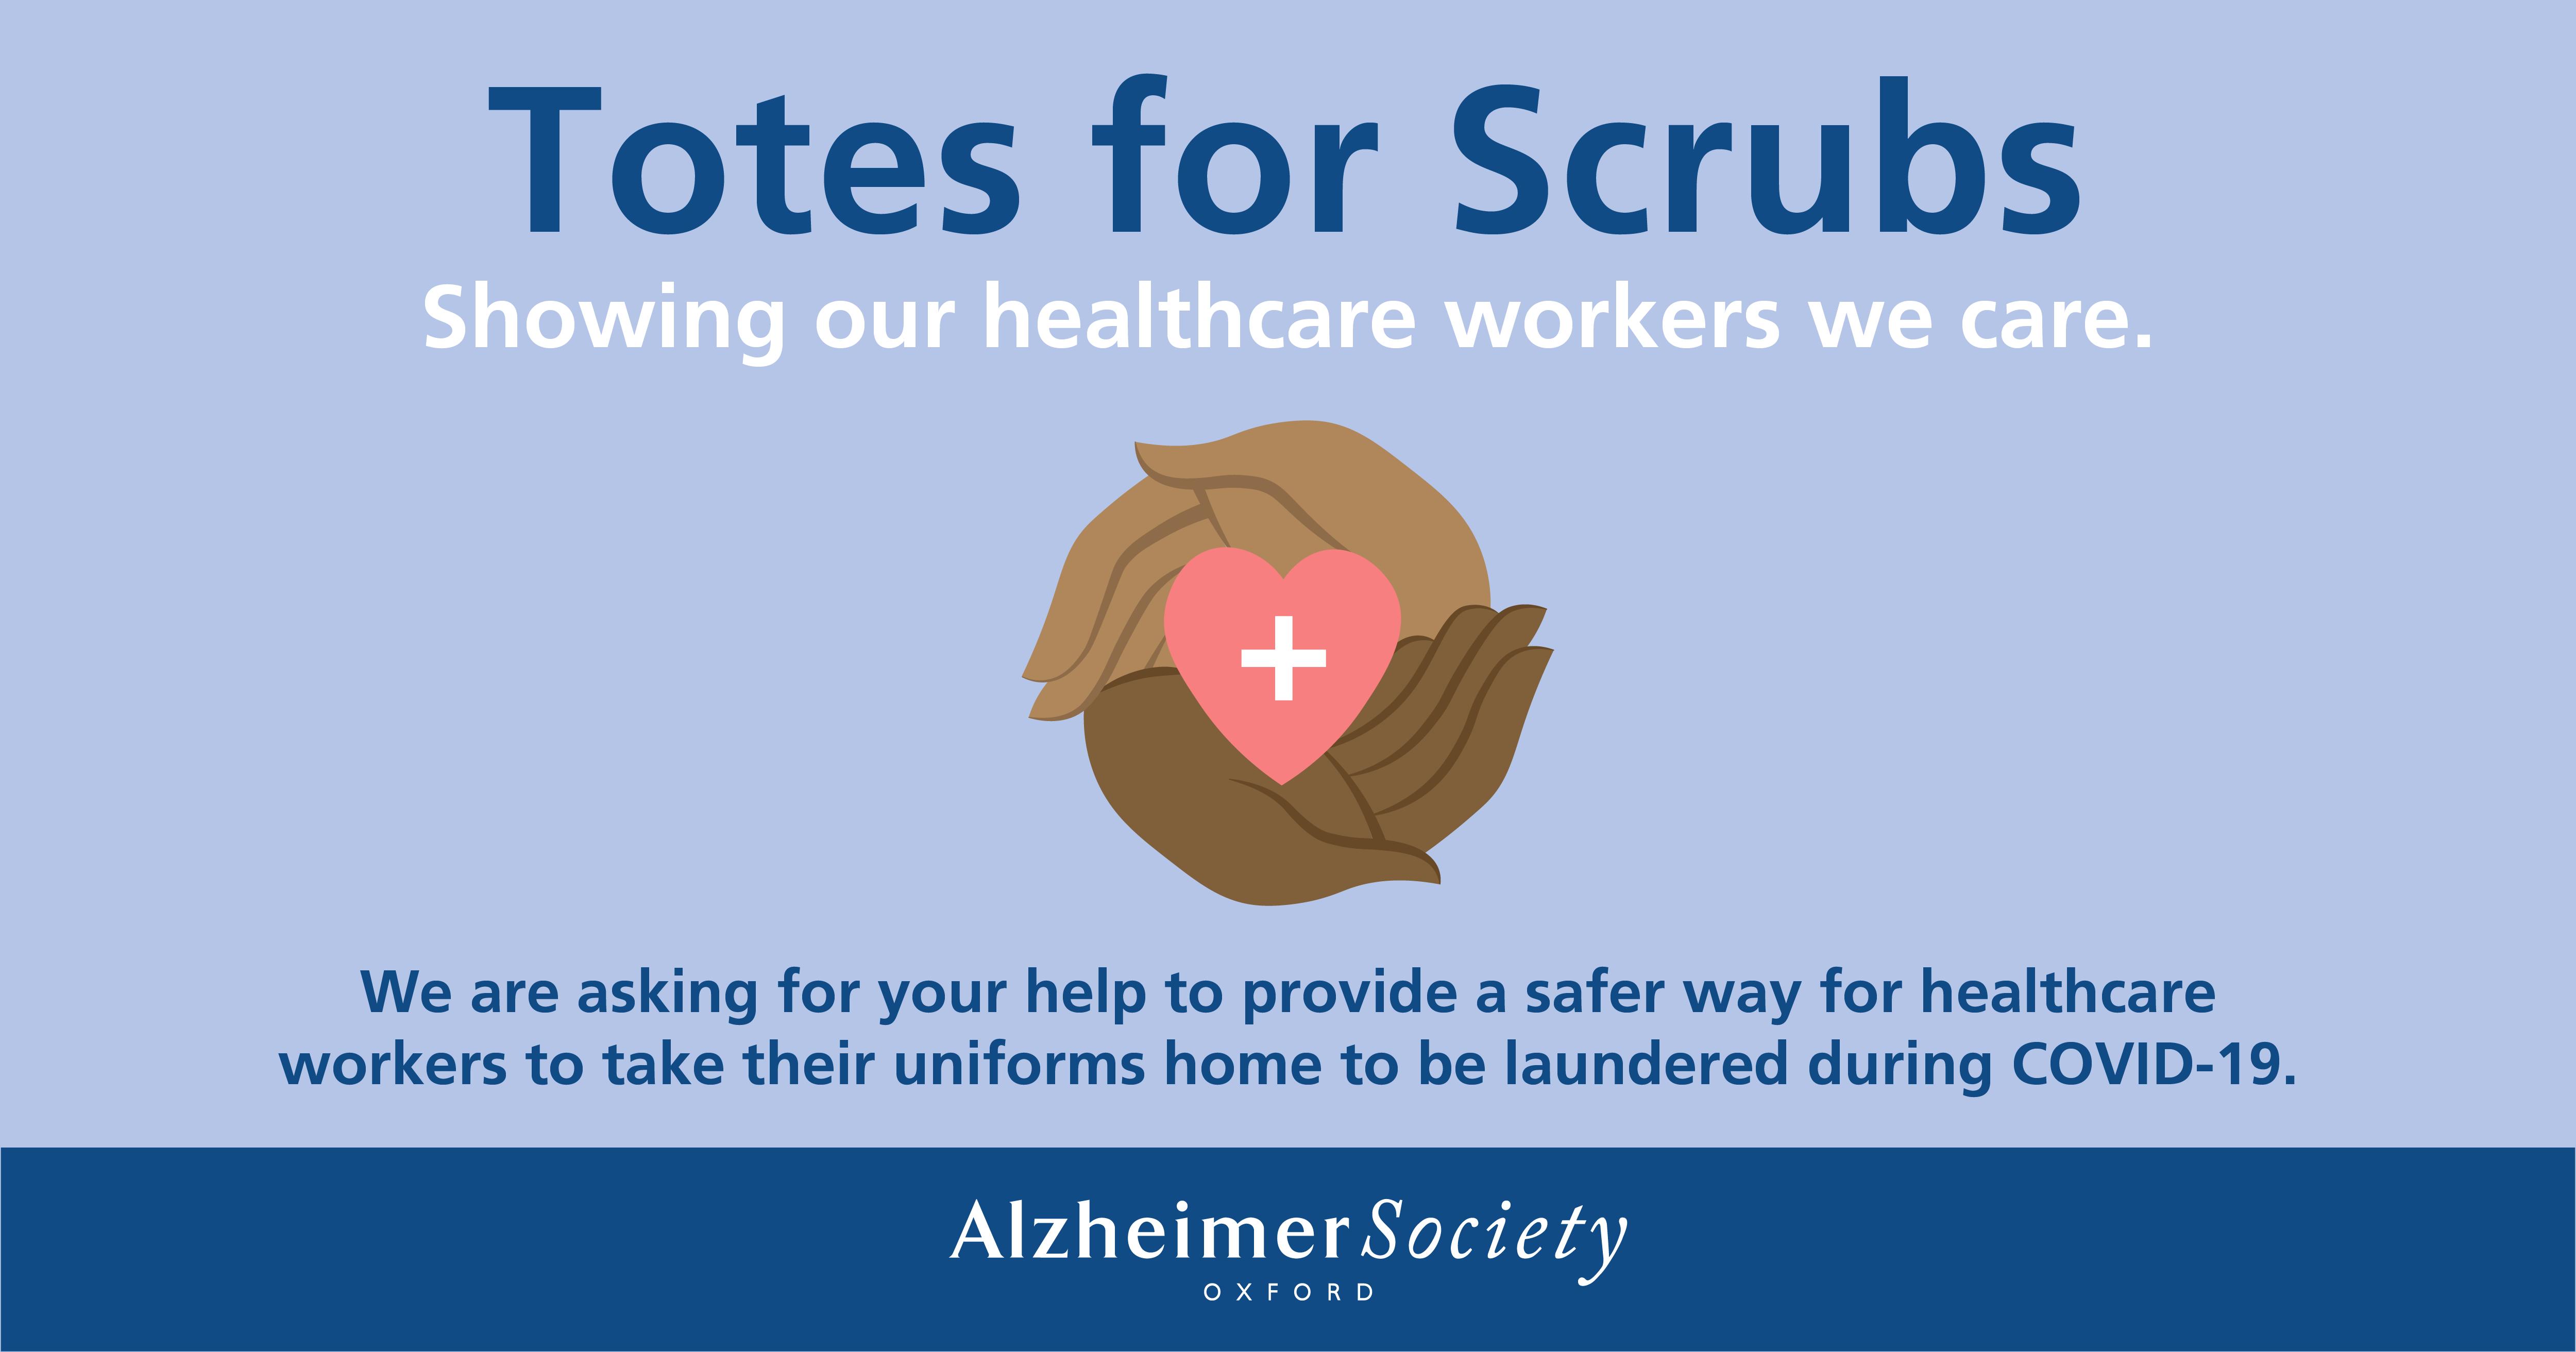 Totes for Scrubs